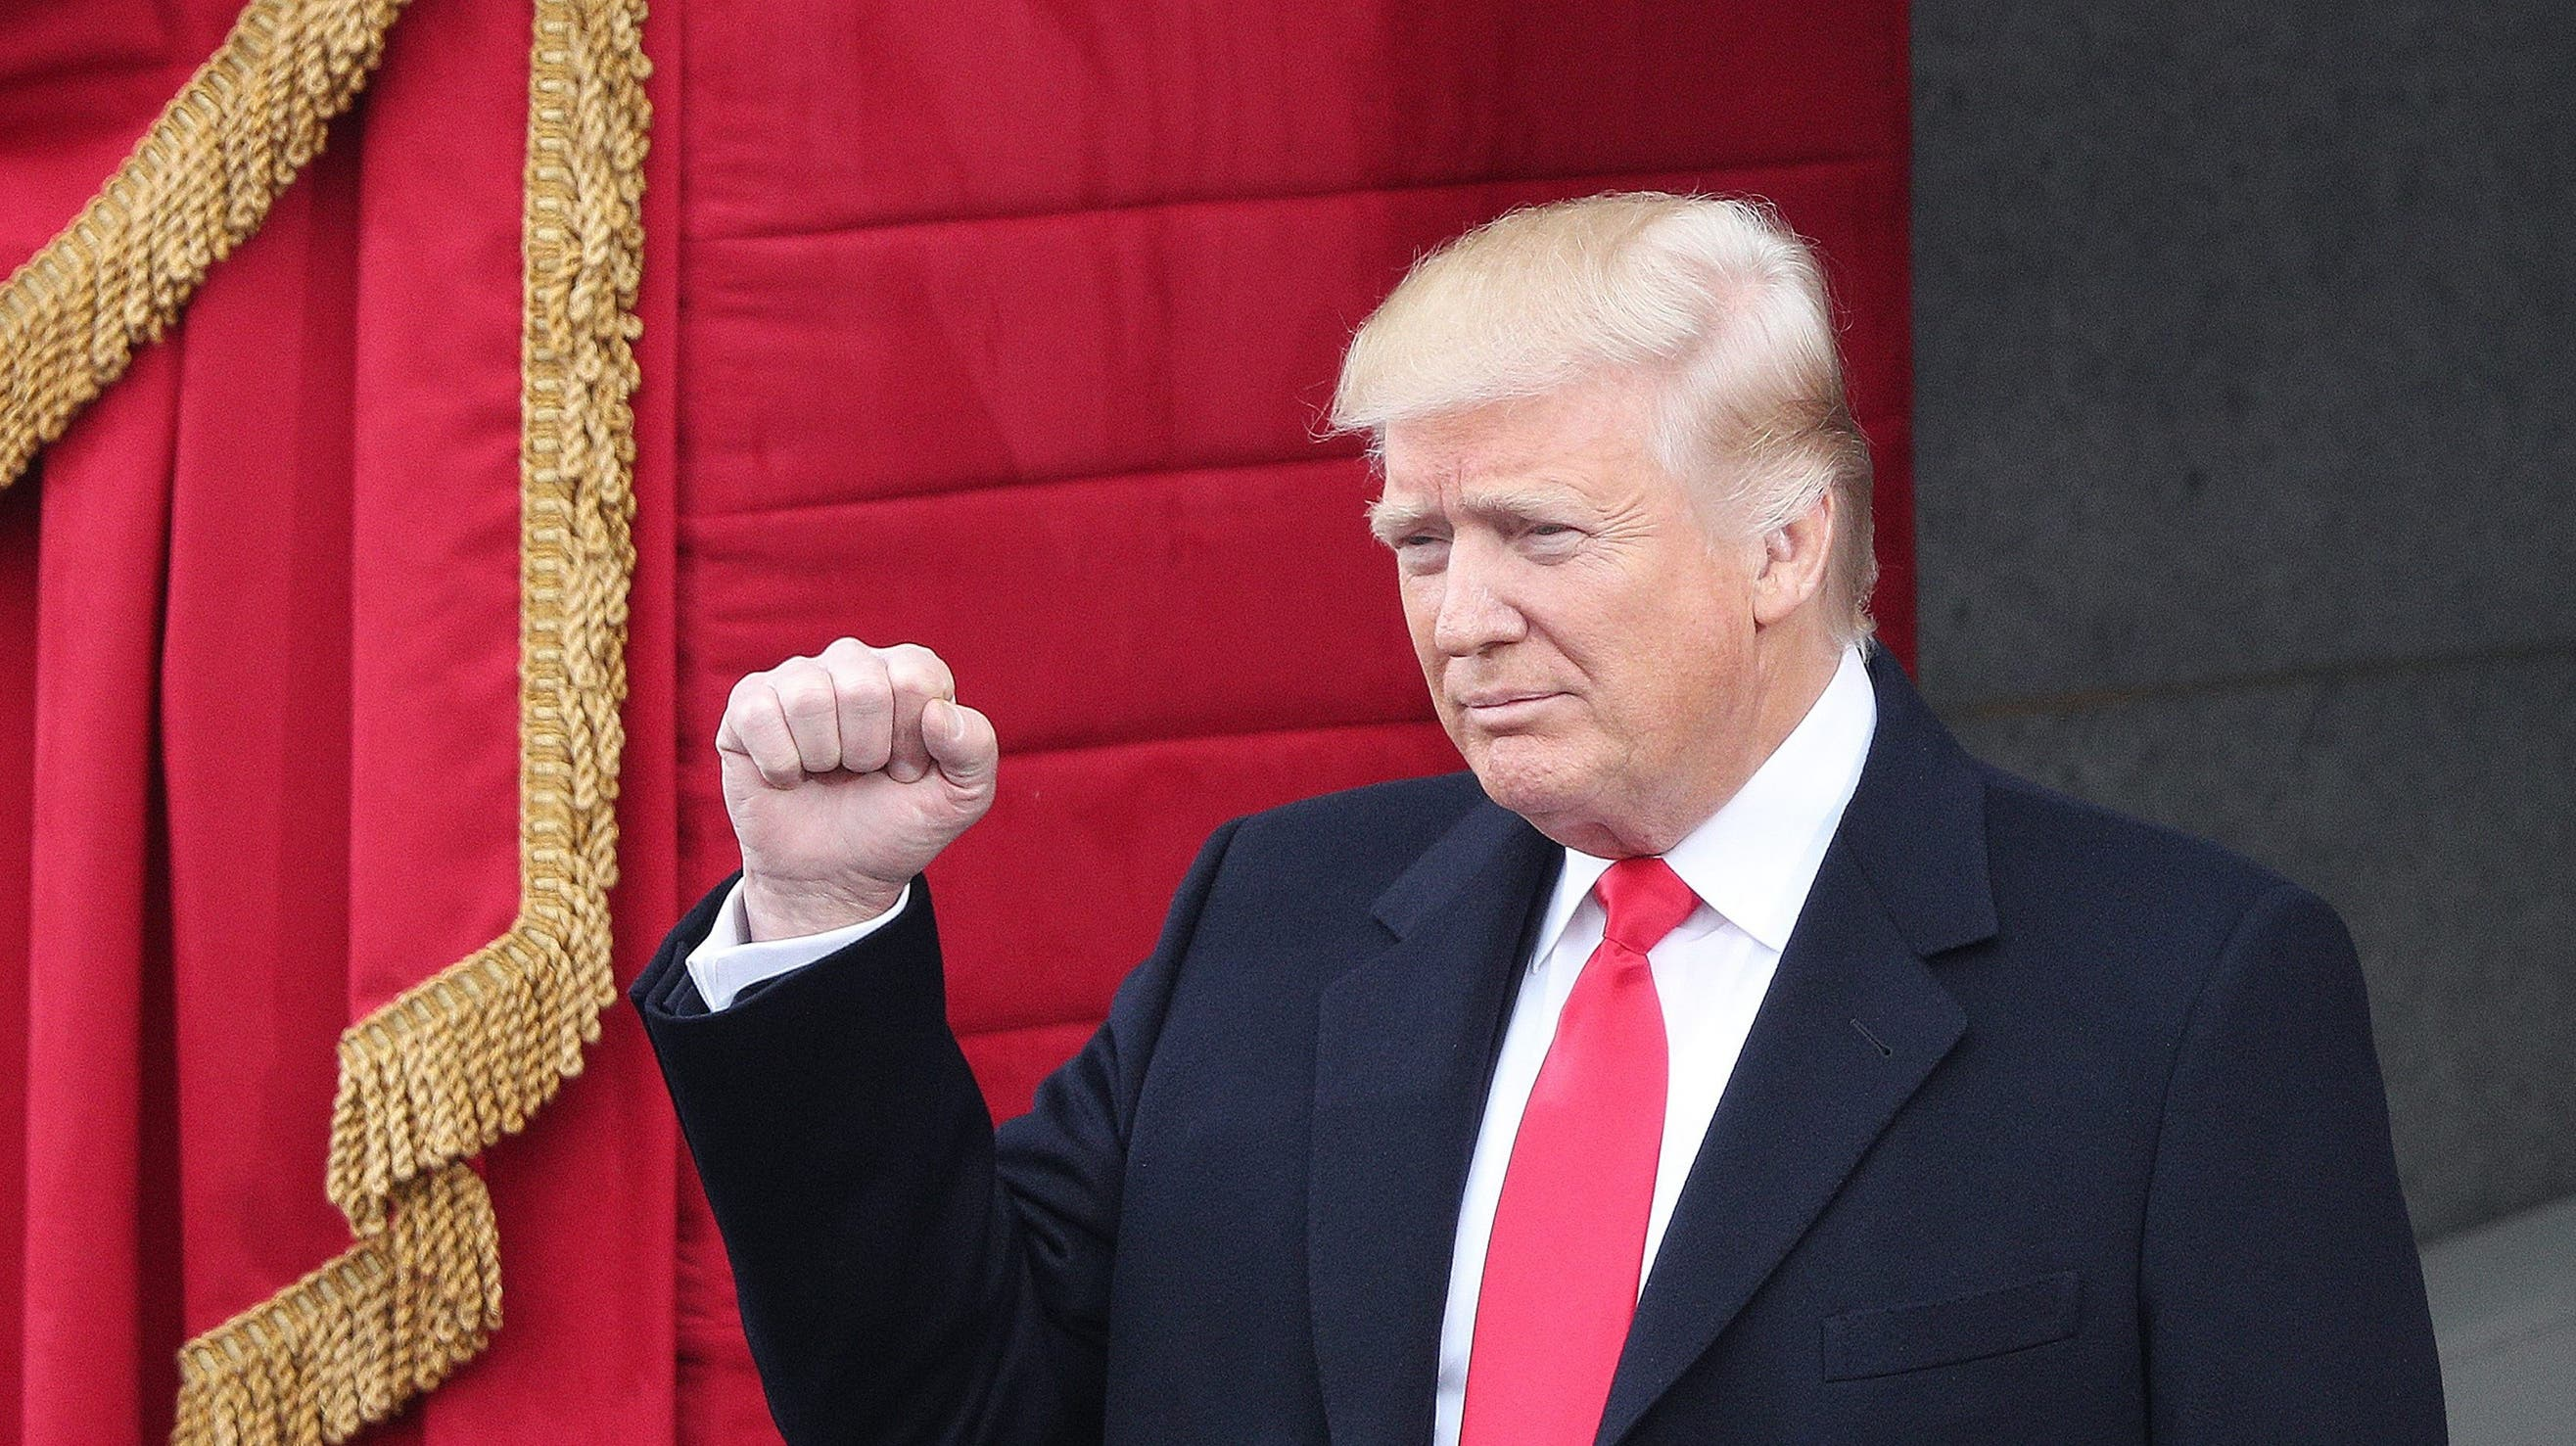 Unter Jubel begrüsst: Donald Trump